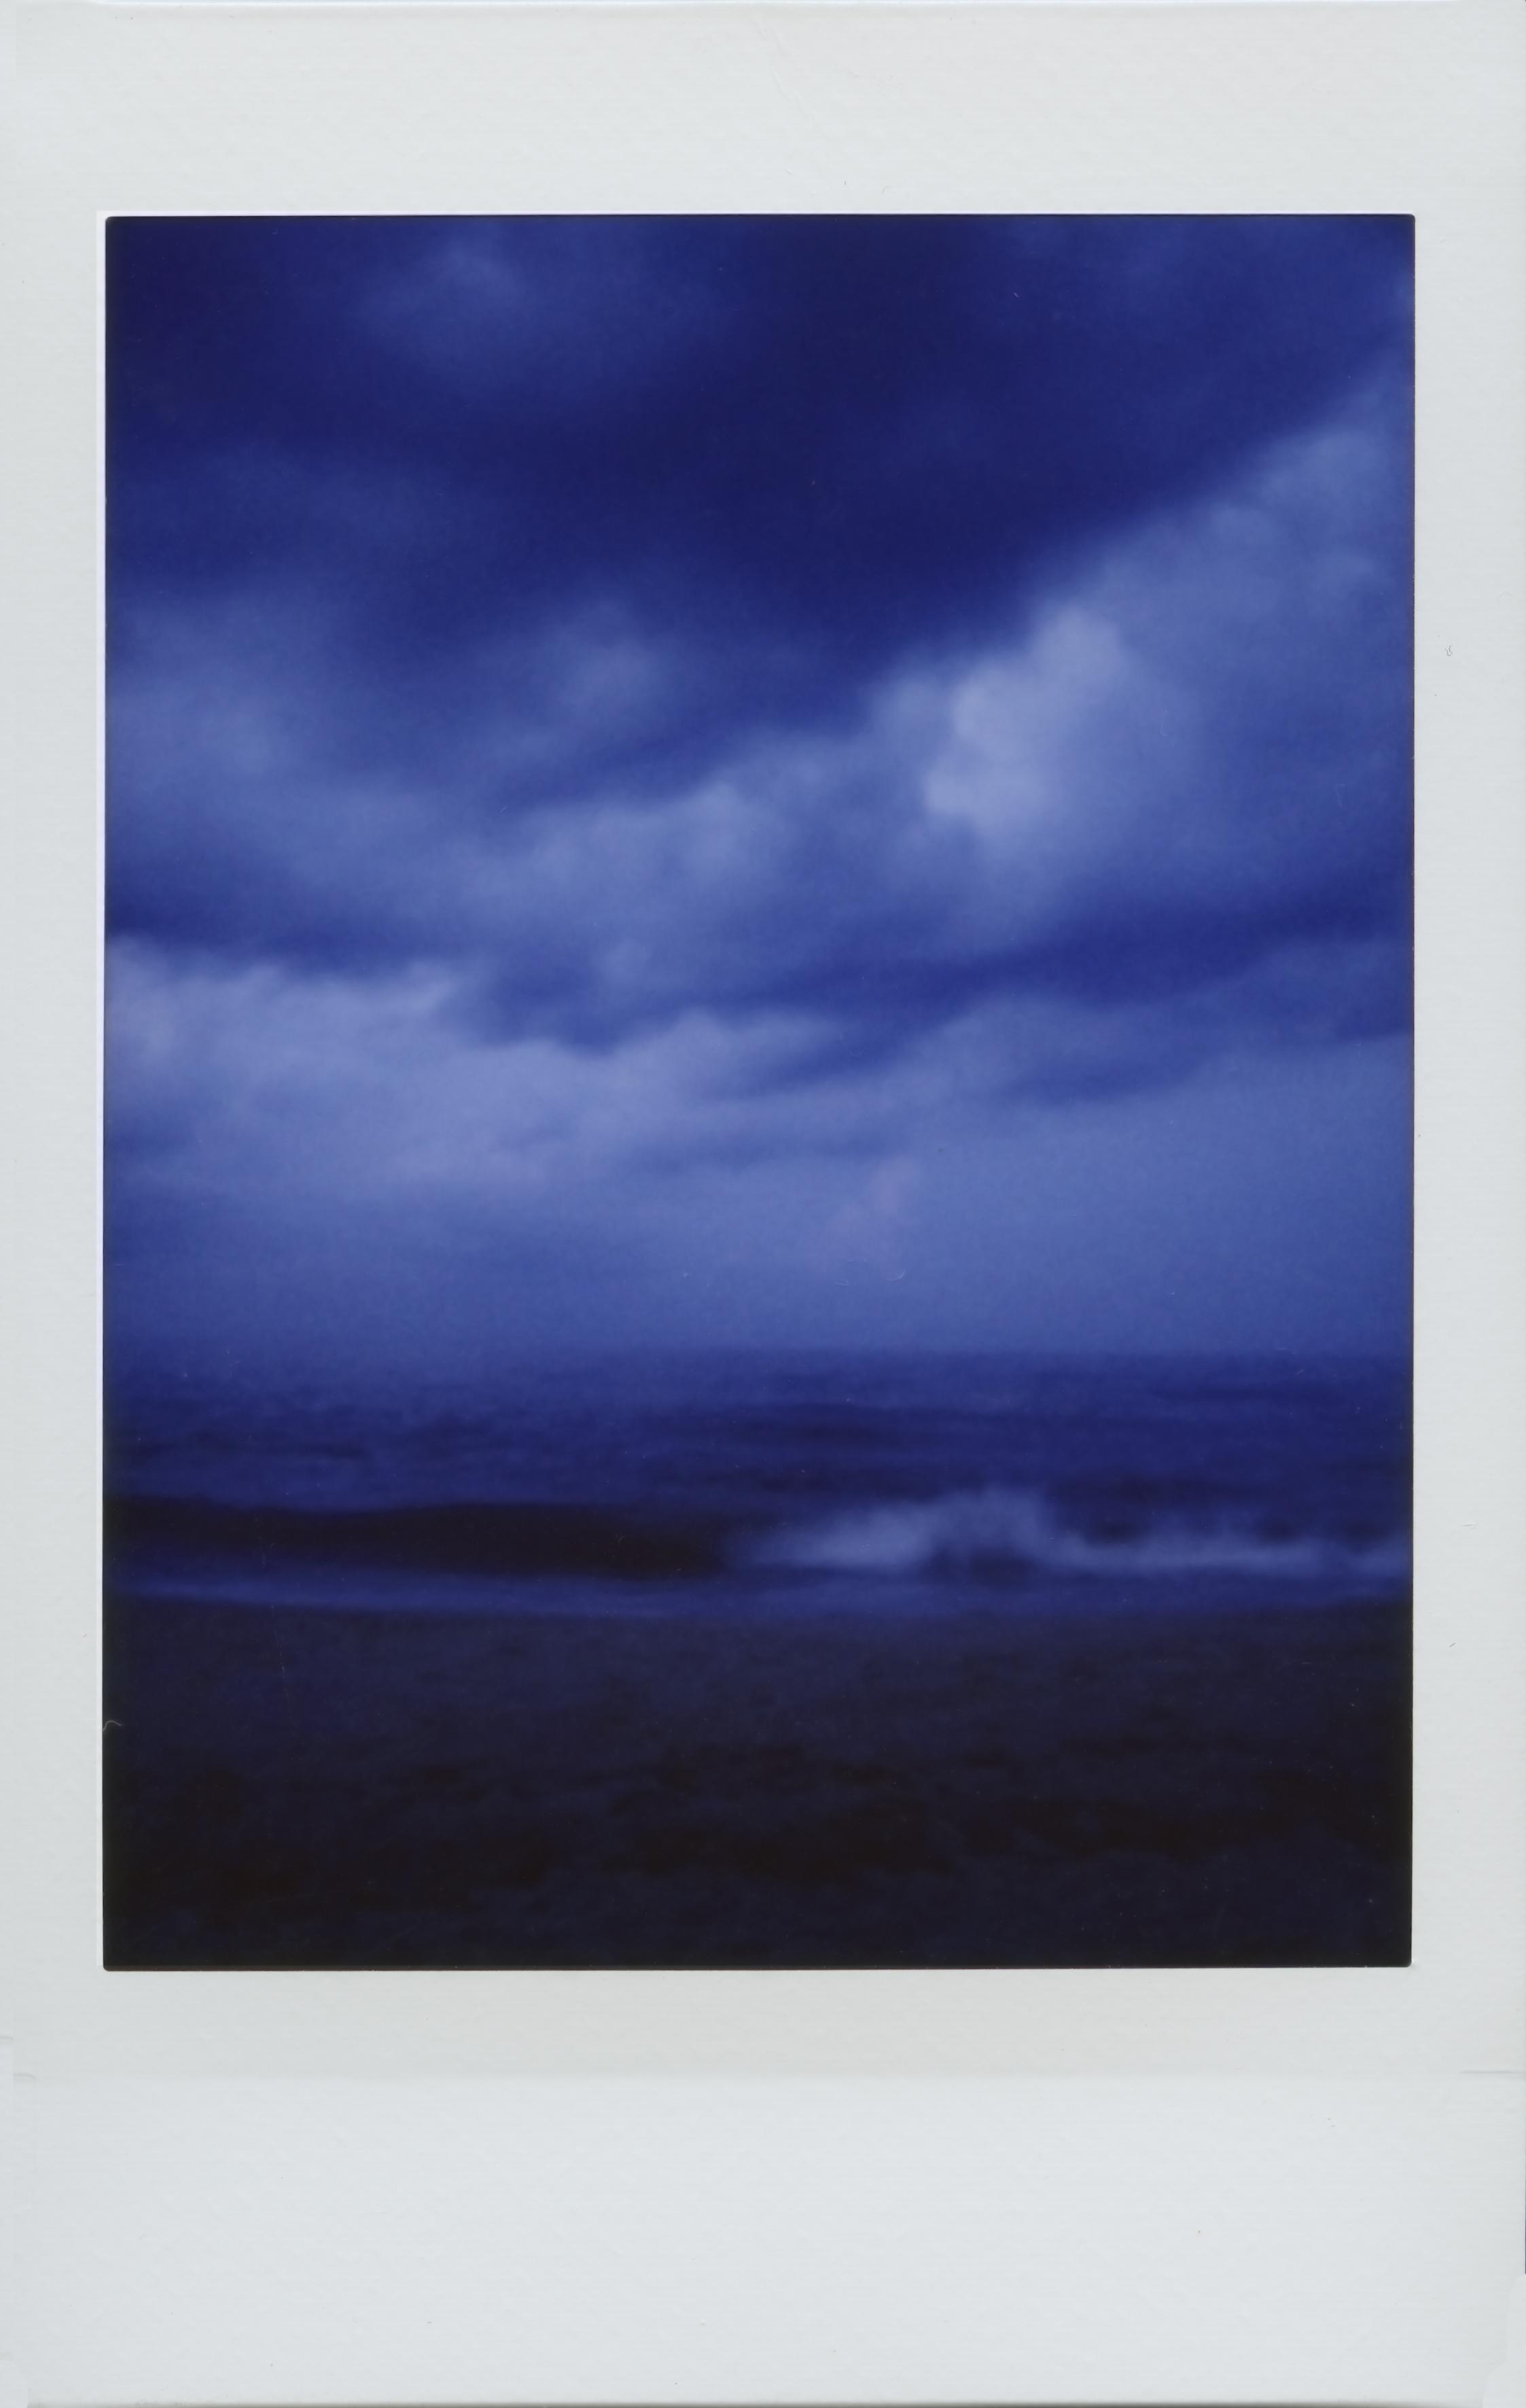 night beach instax.jpg